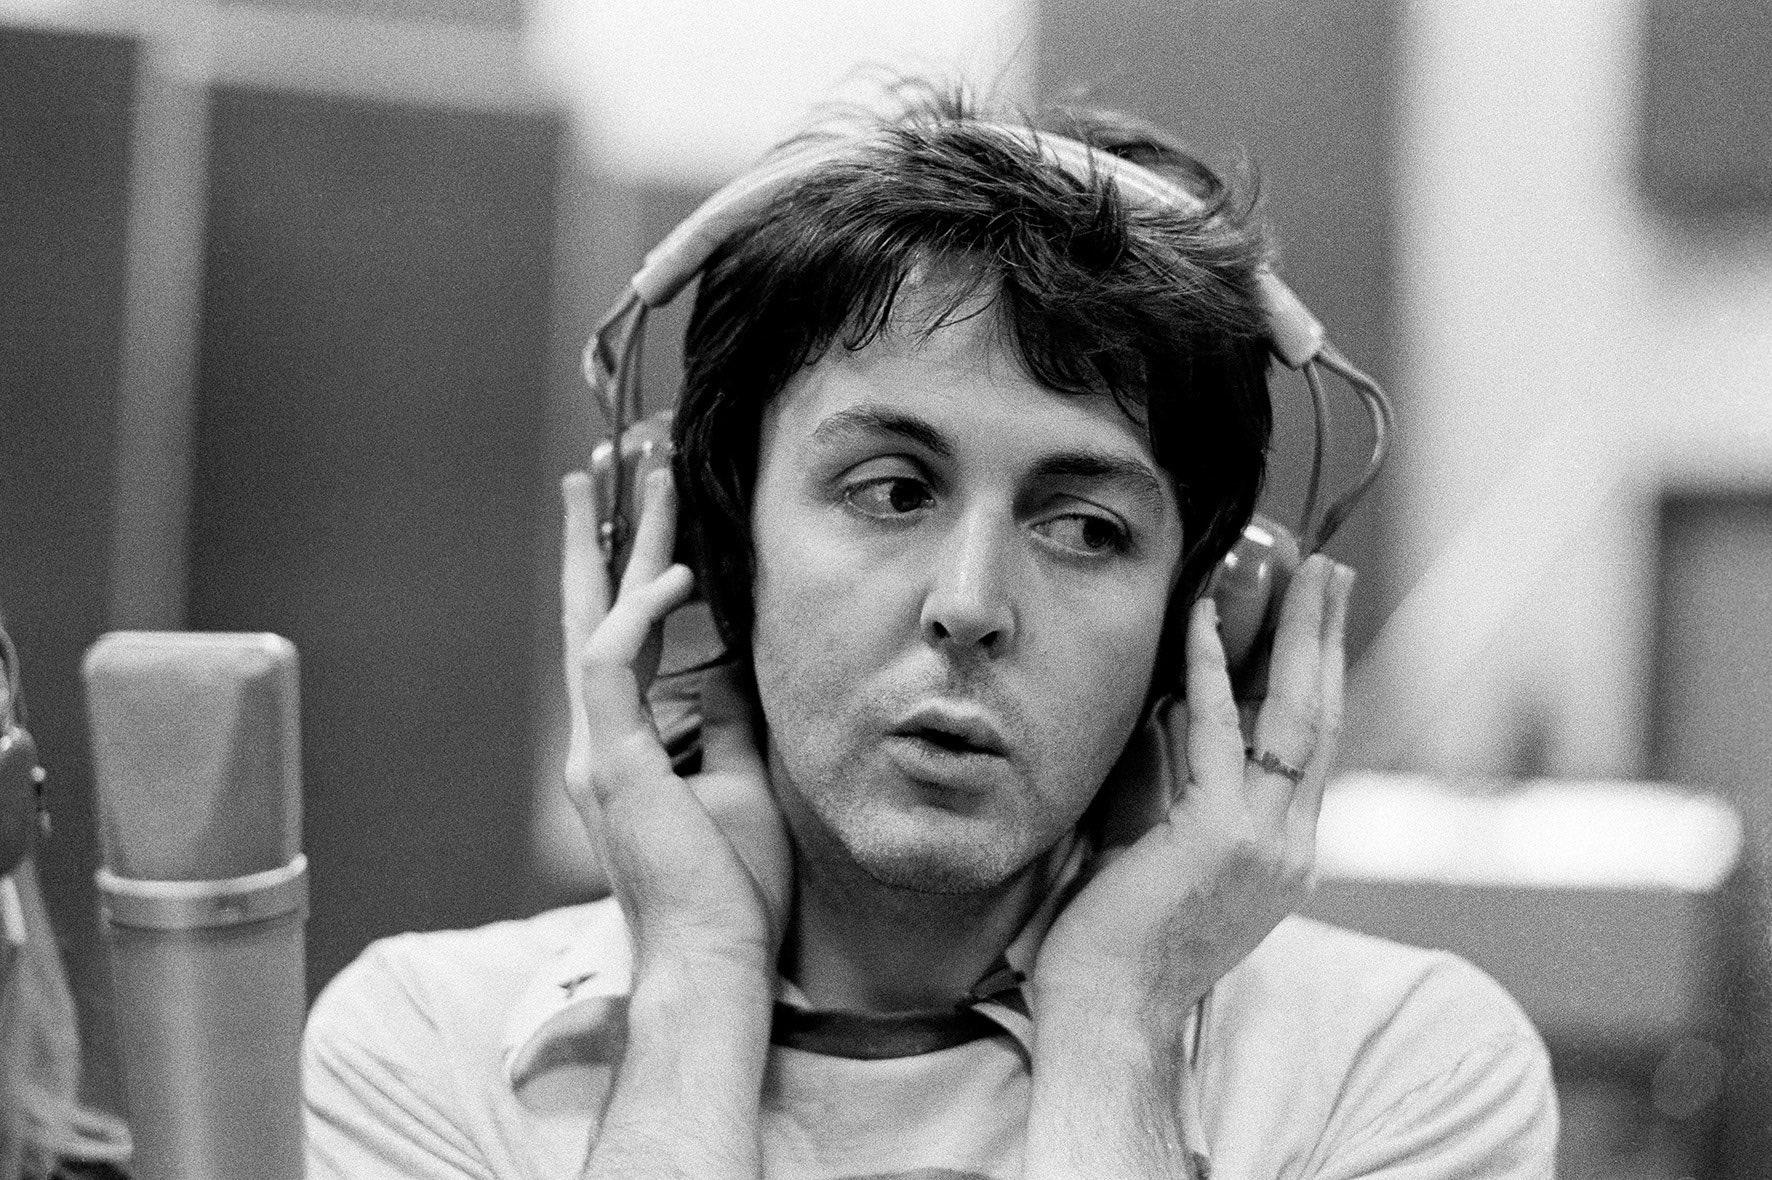 Paul McCartney, recording in Studio, London, 1974